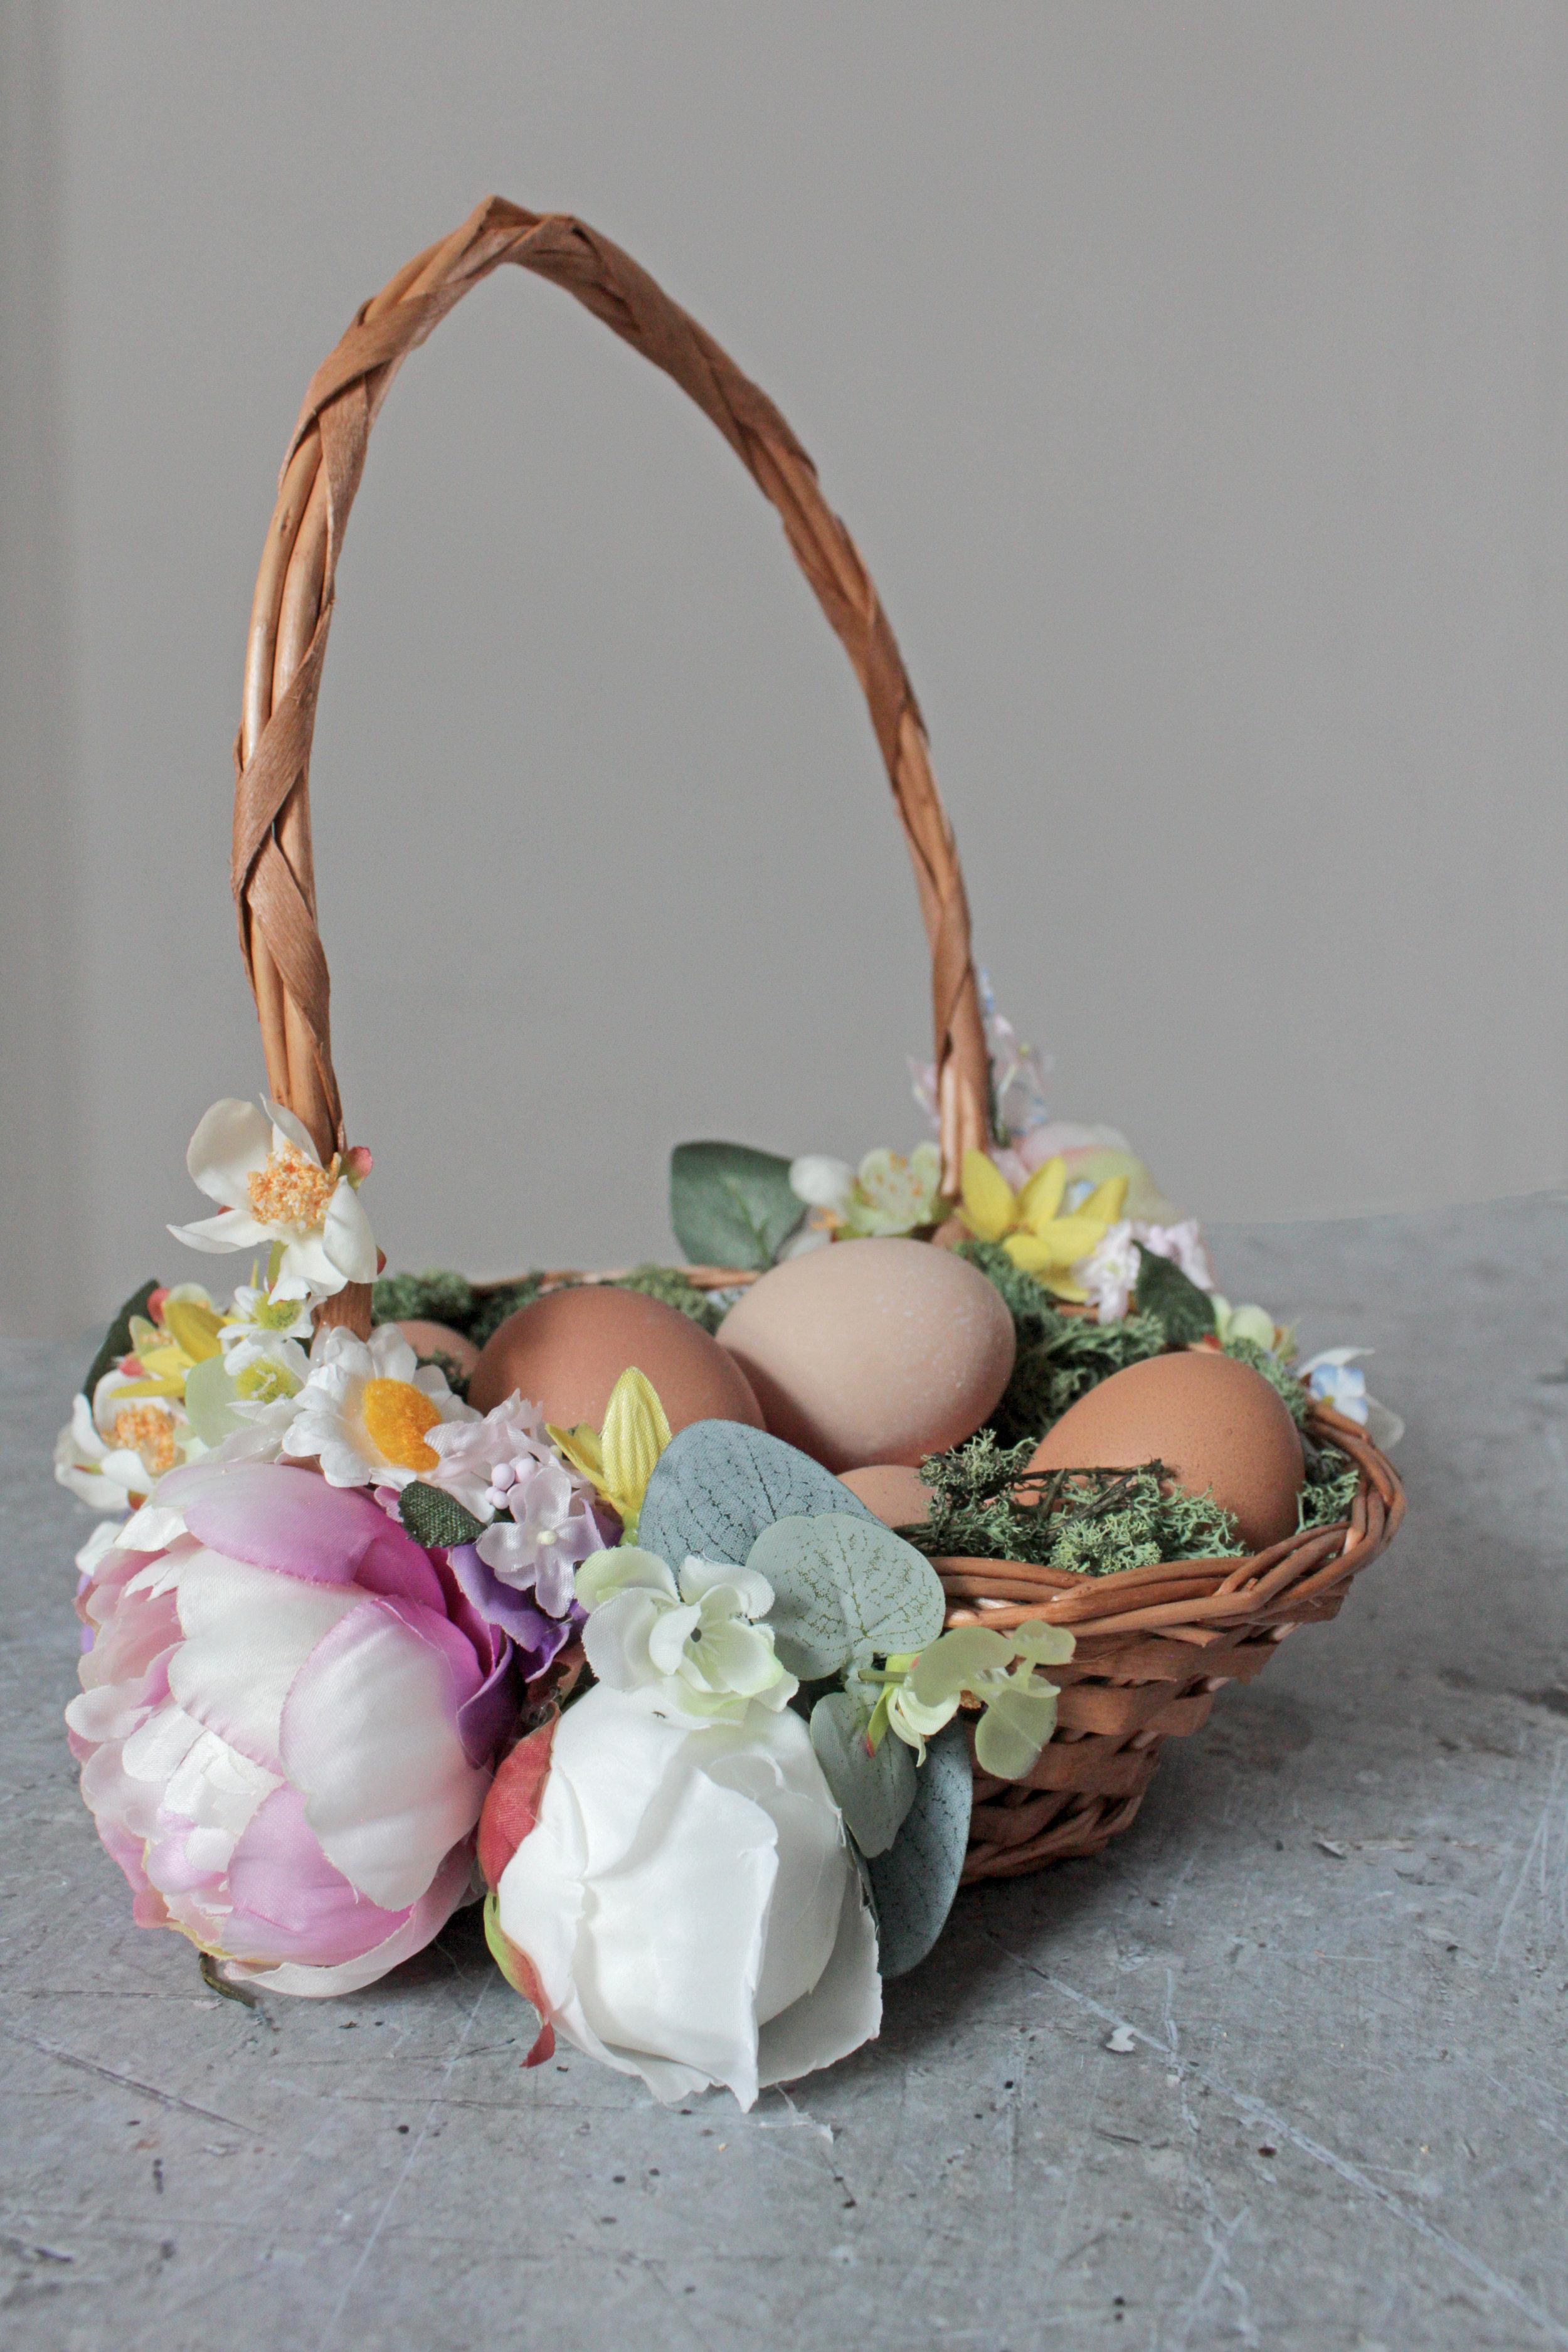 HHH_eggbasket_faux_02B.jpg